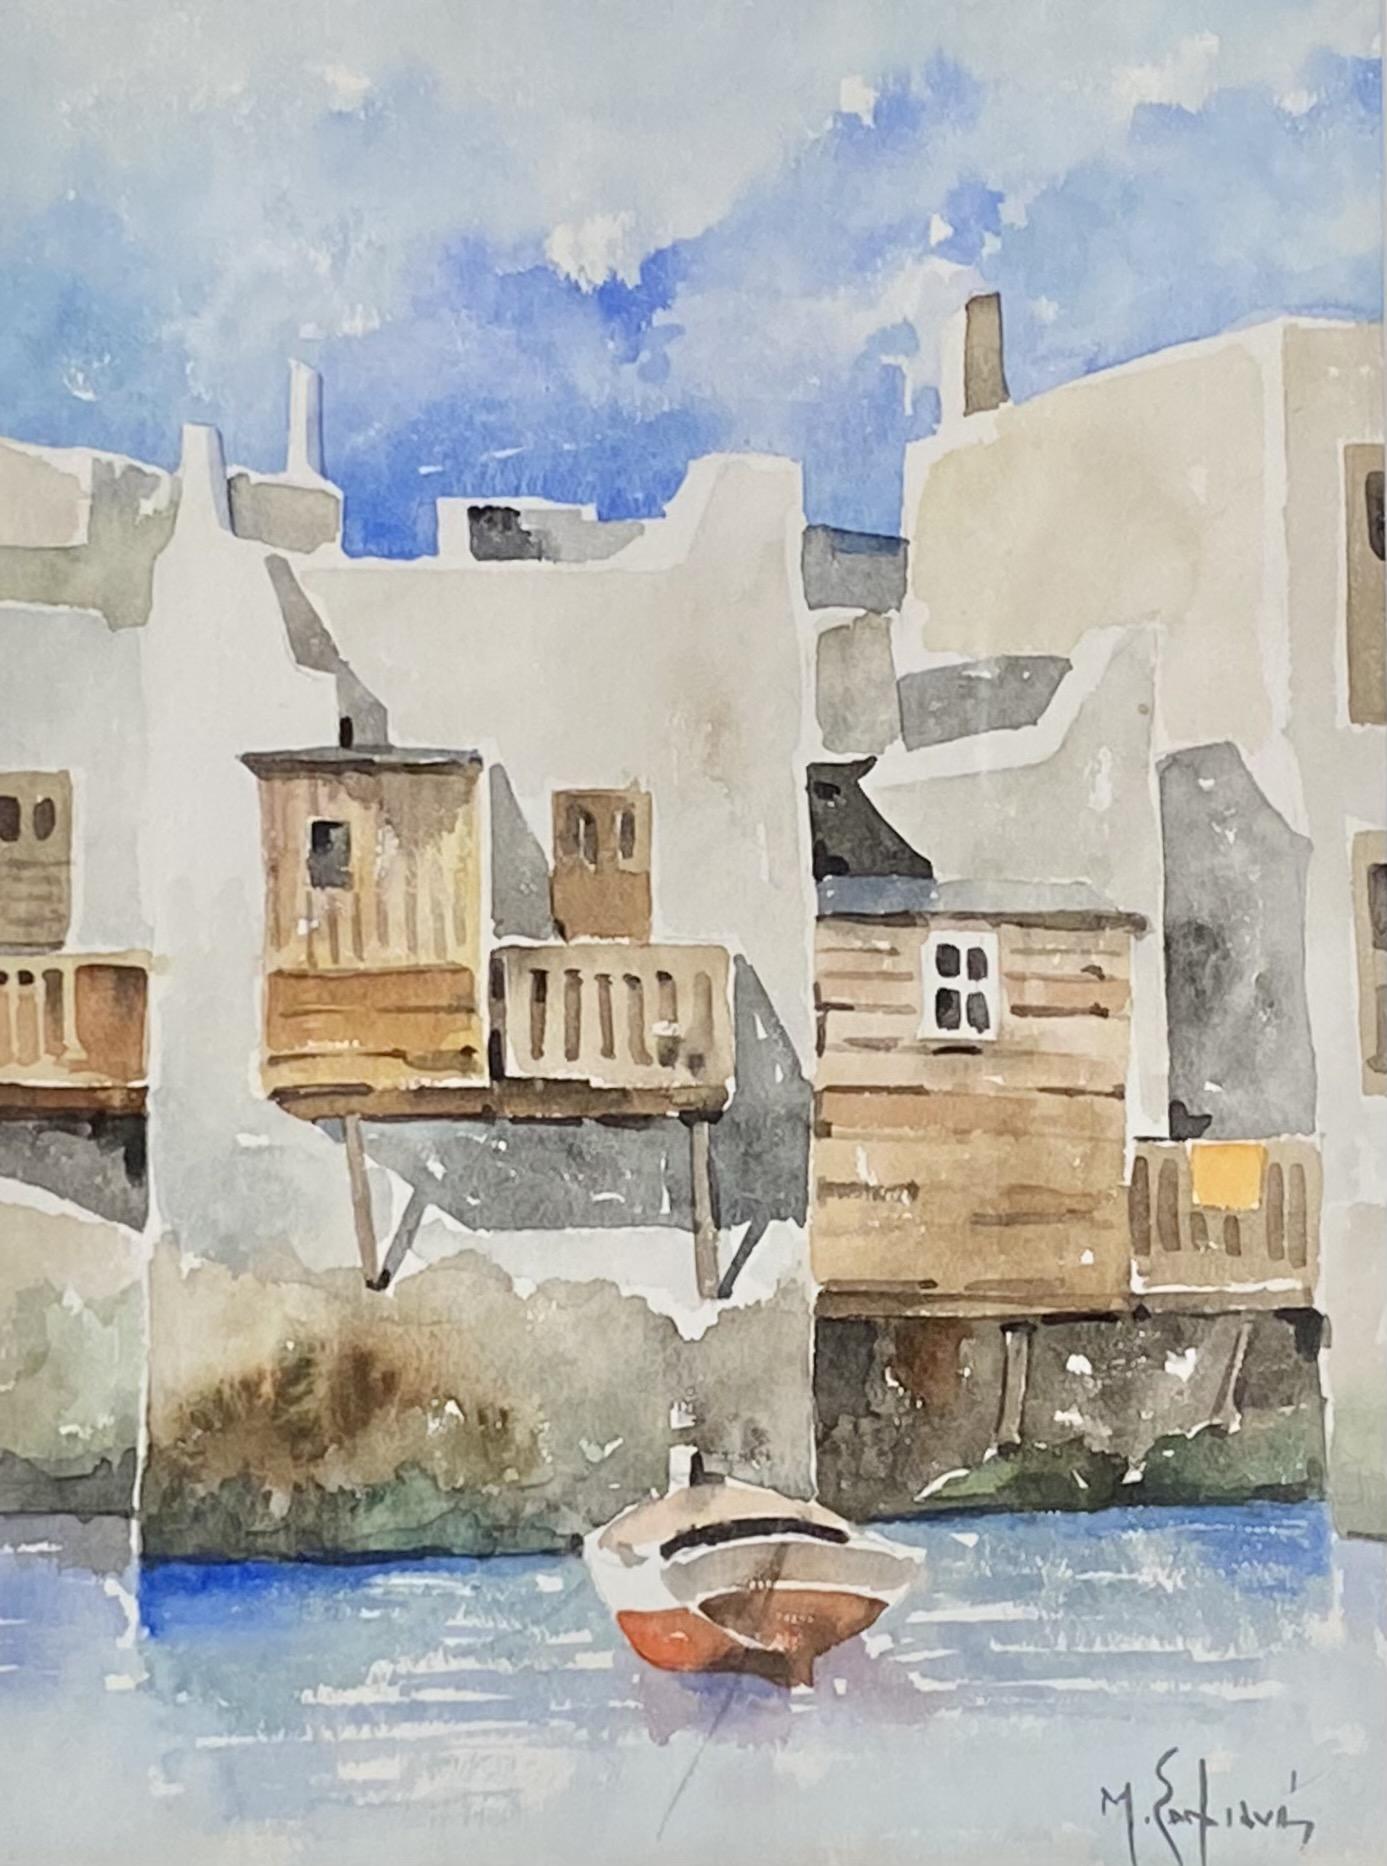 Manos Sofianos (Greek, 1922-1986), Mykonos, watercolor on paper, 31.5 x 24.5 cm.